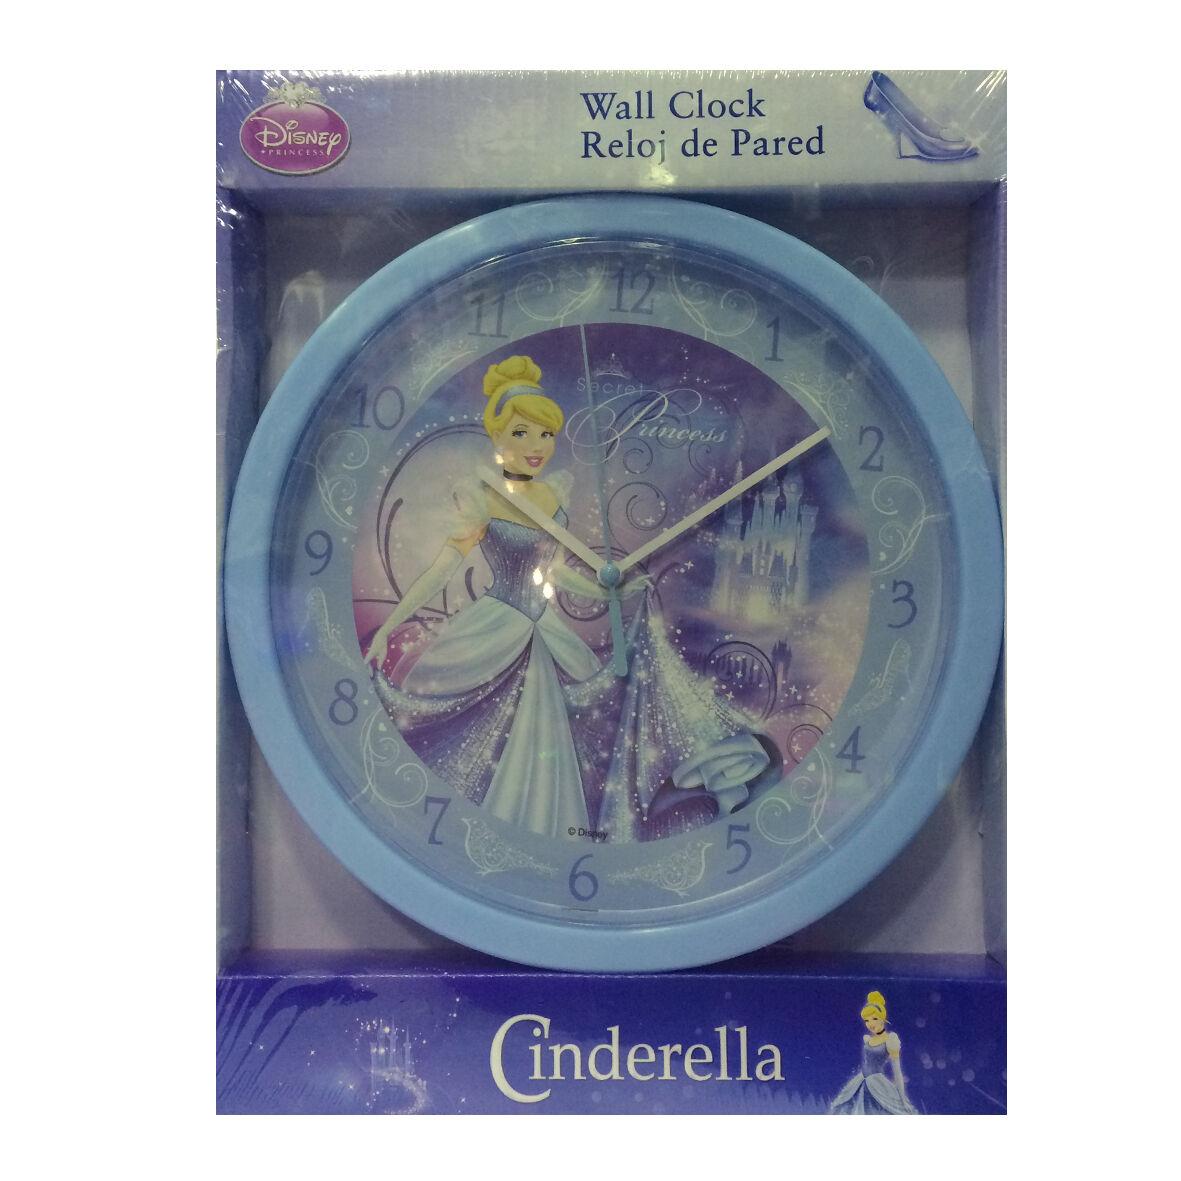 PRINCIPESSE CENERENTOLA orologio da parete azzurro 25 cm idea regalo